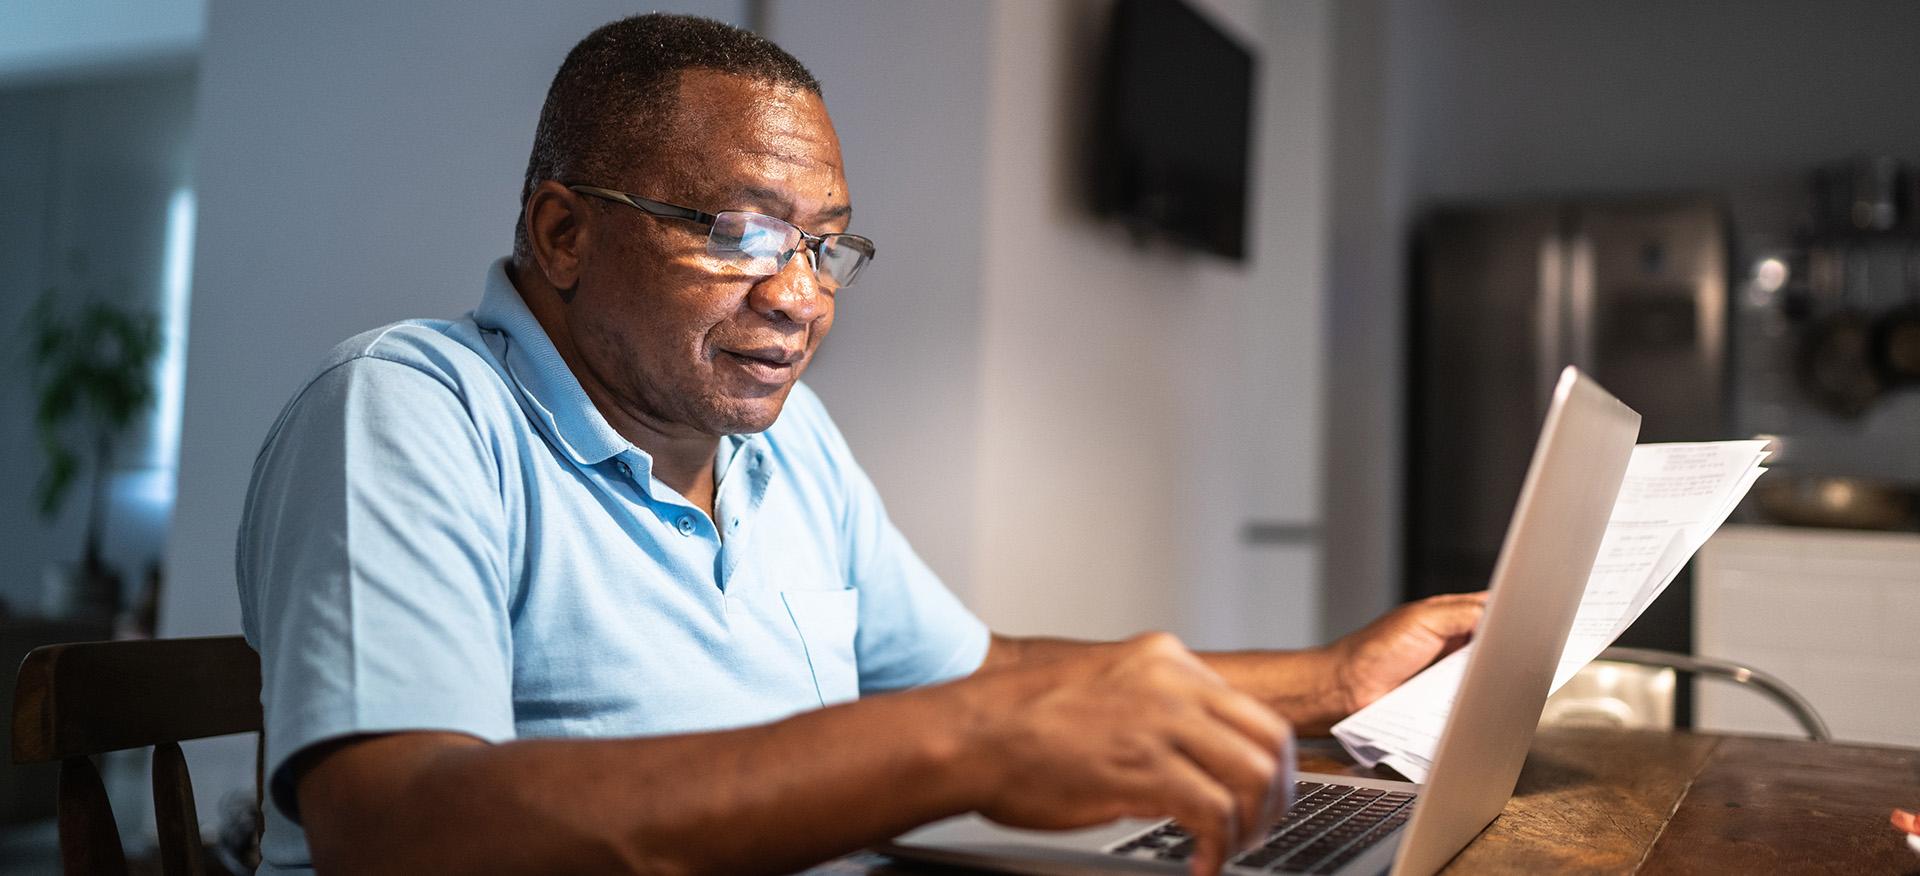 Man vult belastingaangifte online in